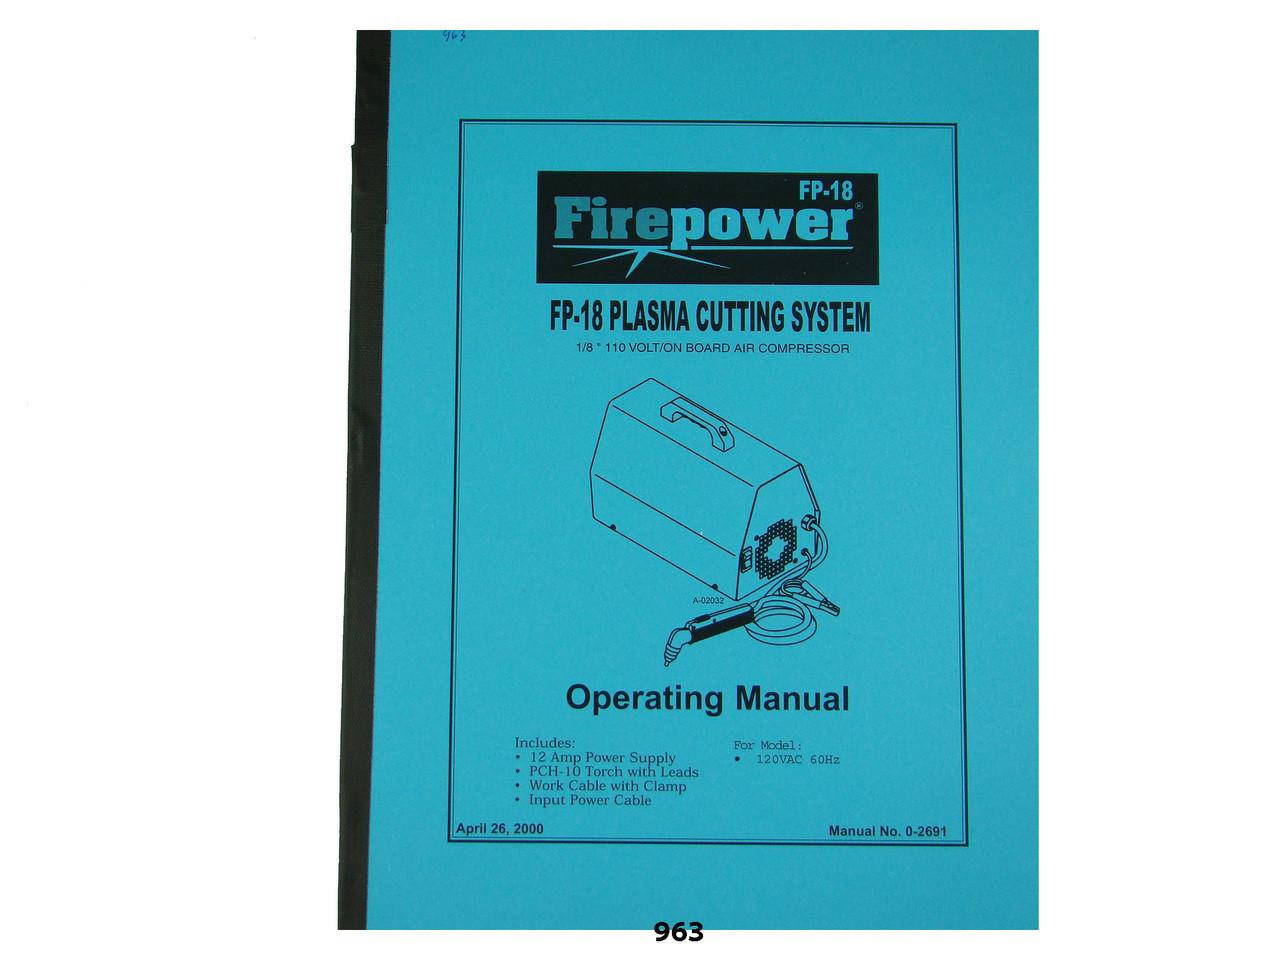 Thermal Dynamics Firepower FP-18 Plasma Cutter Operating Manual *963